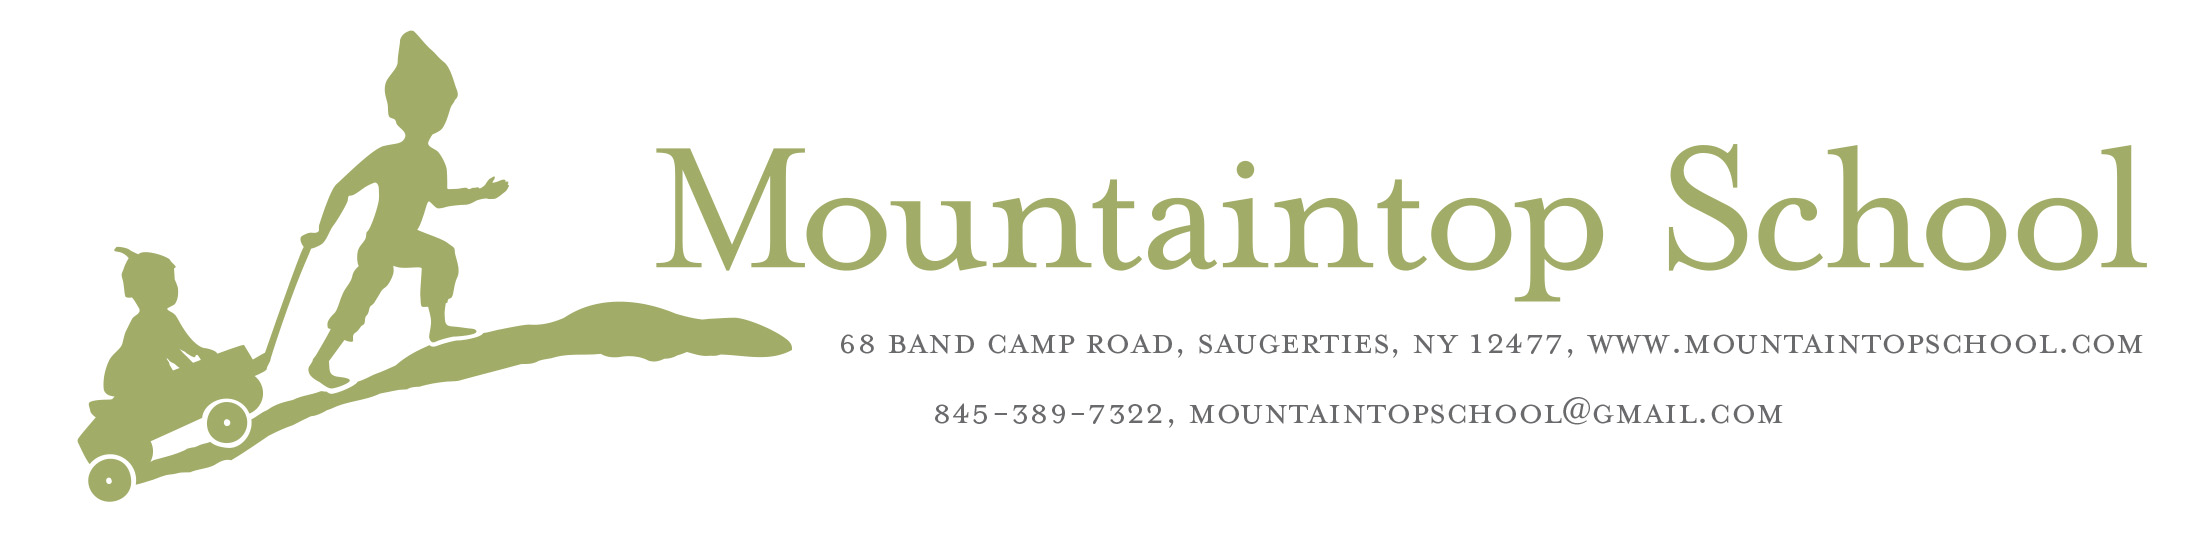 Mountaintop School